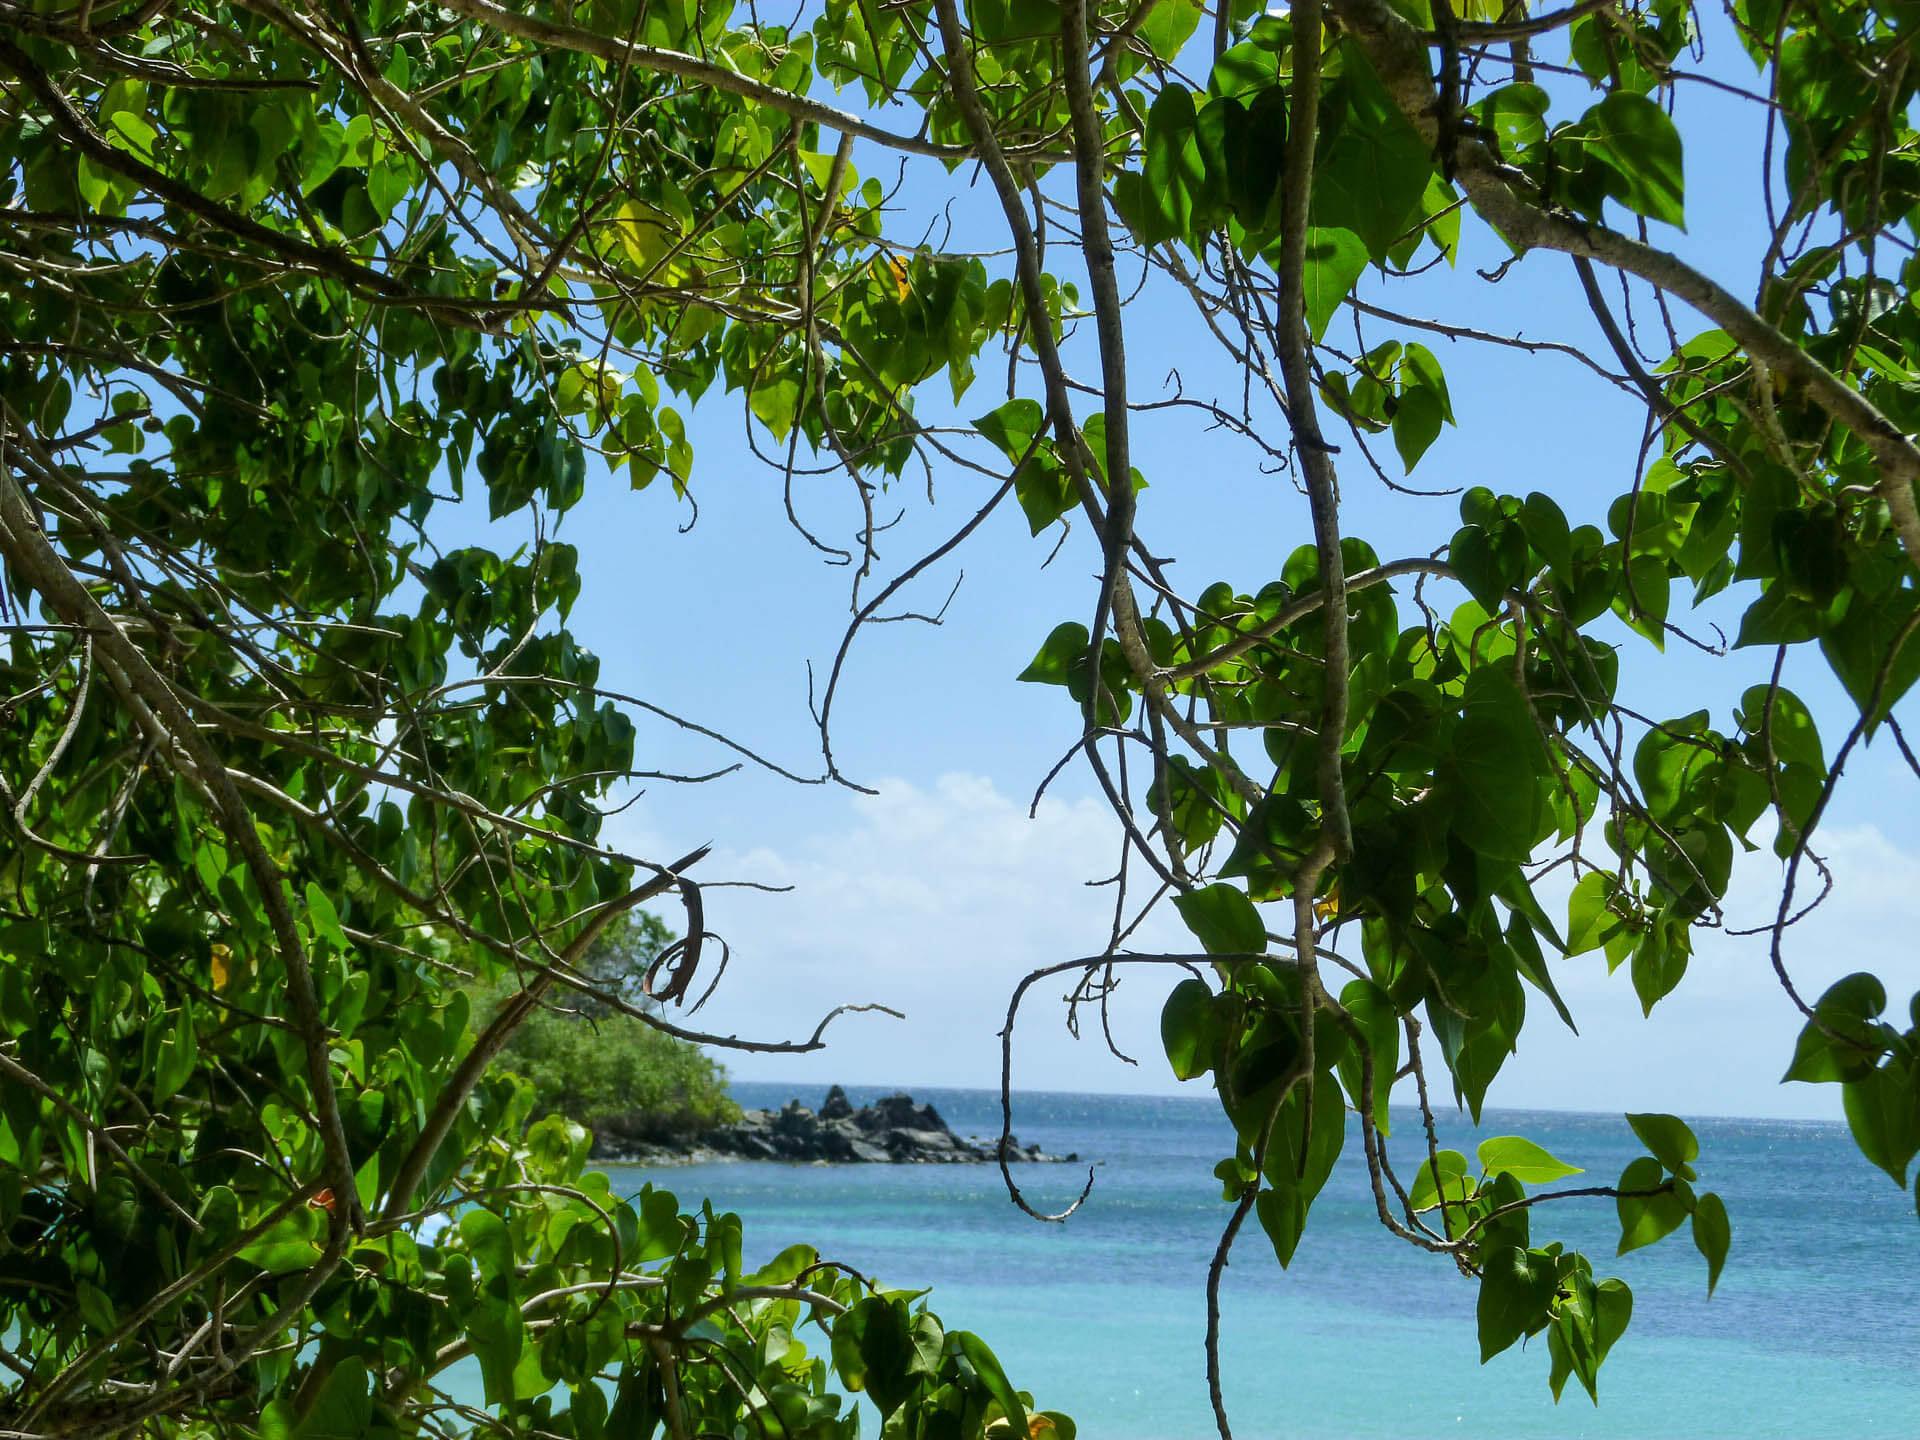 foliage and beach